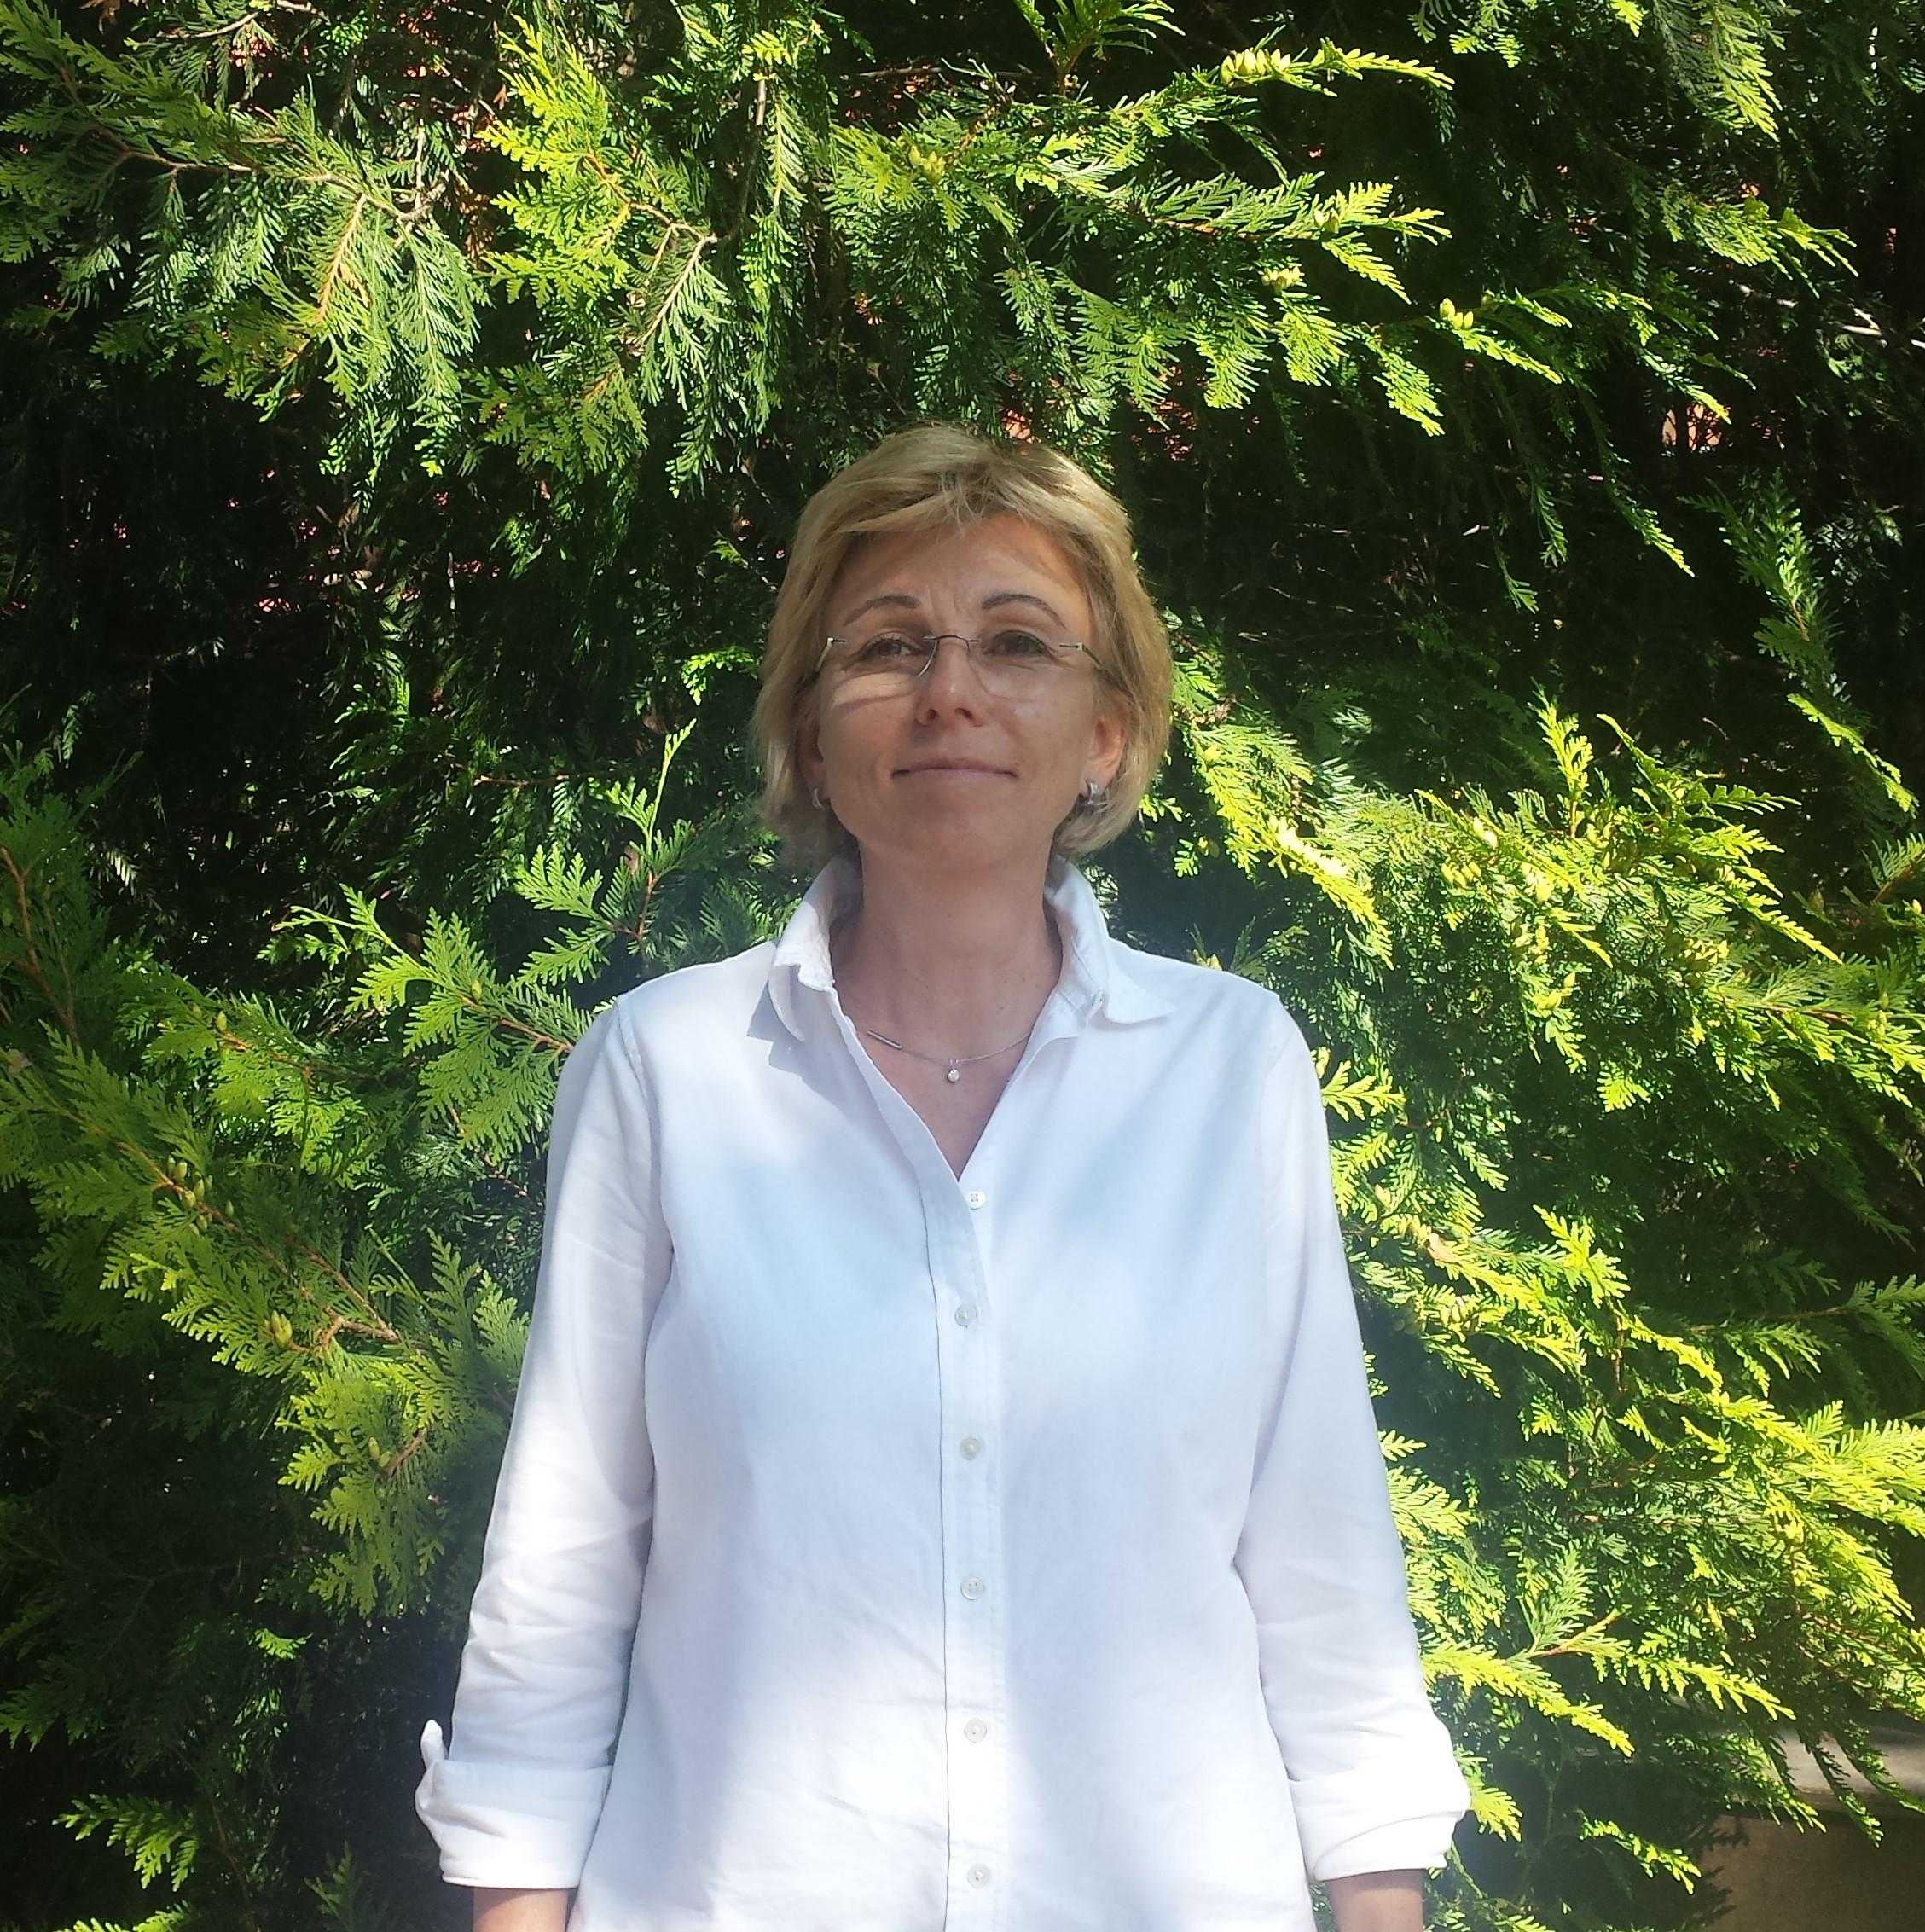 Birgit Hahne